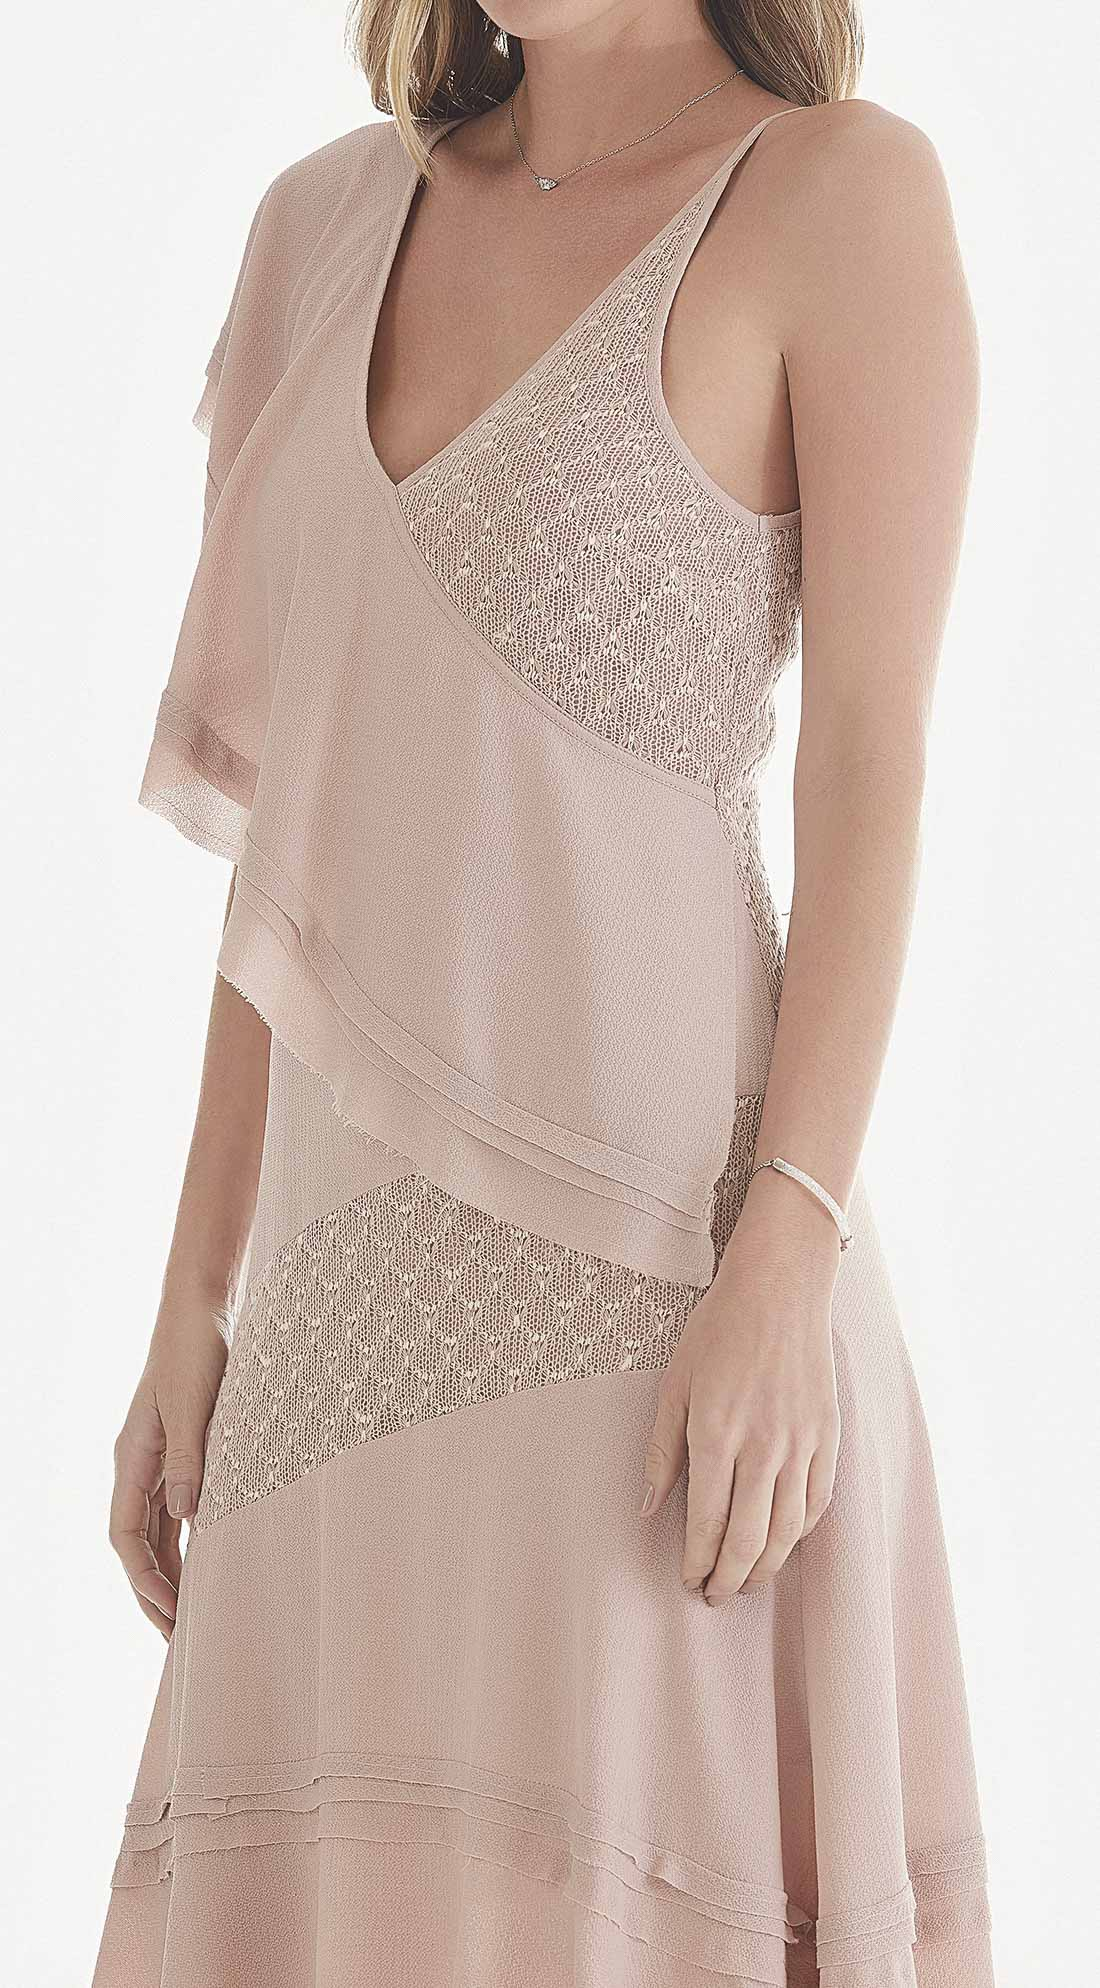 67d8044fa66d Vestido Assimetrico Decote V Detalhe Renda Rosa - Maria Valentina